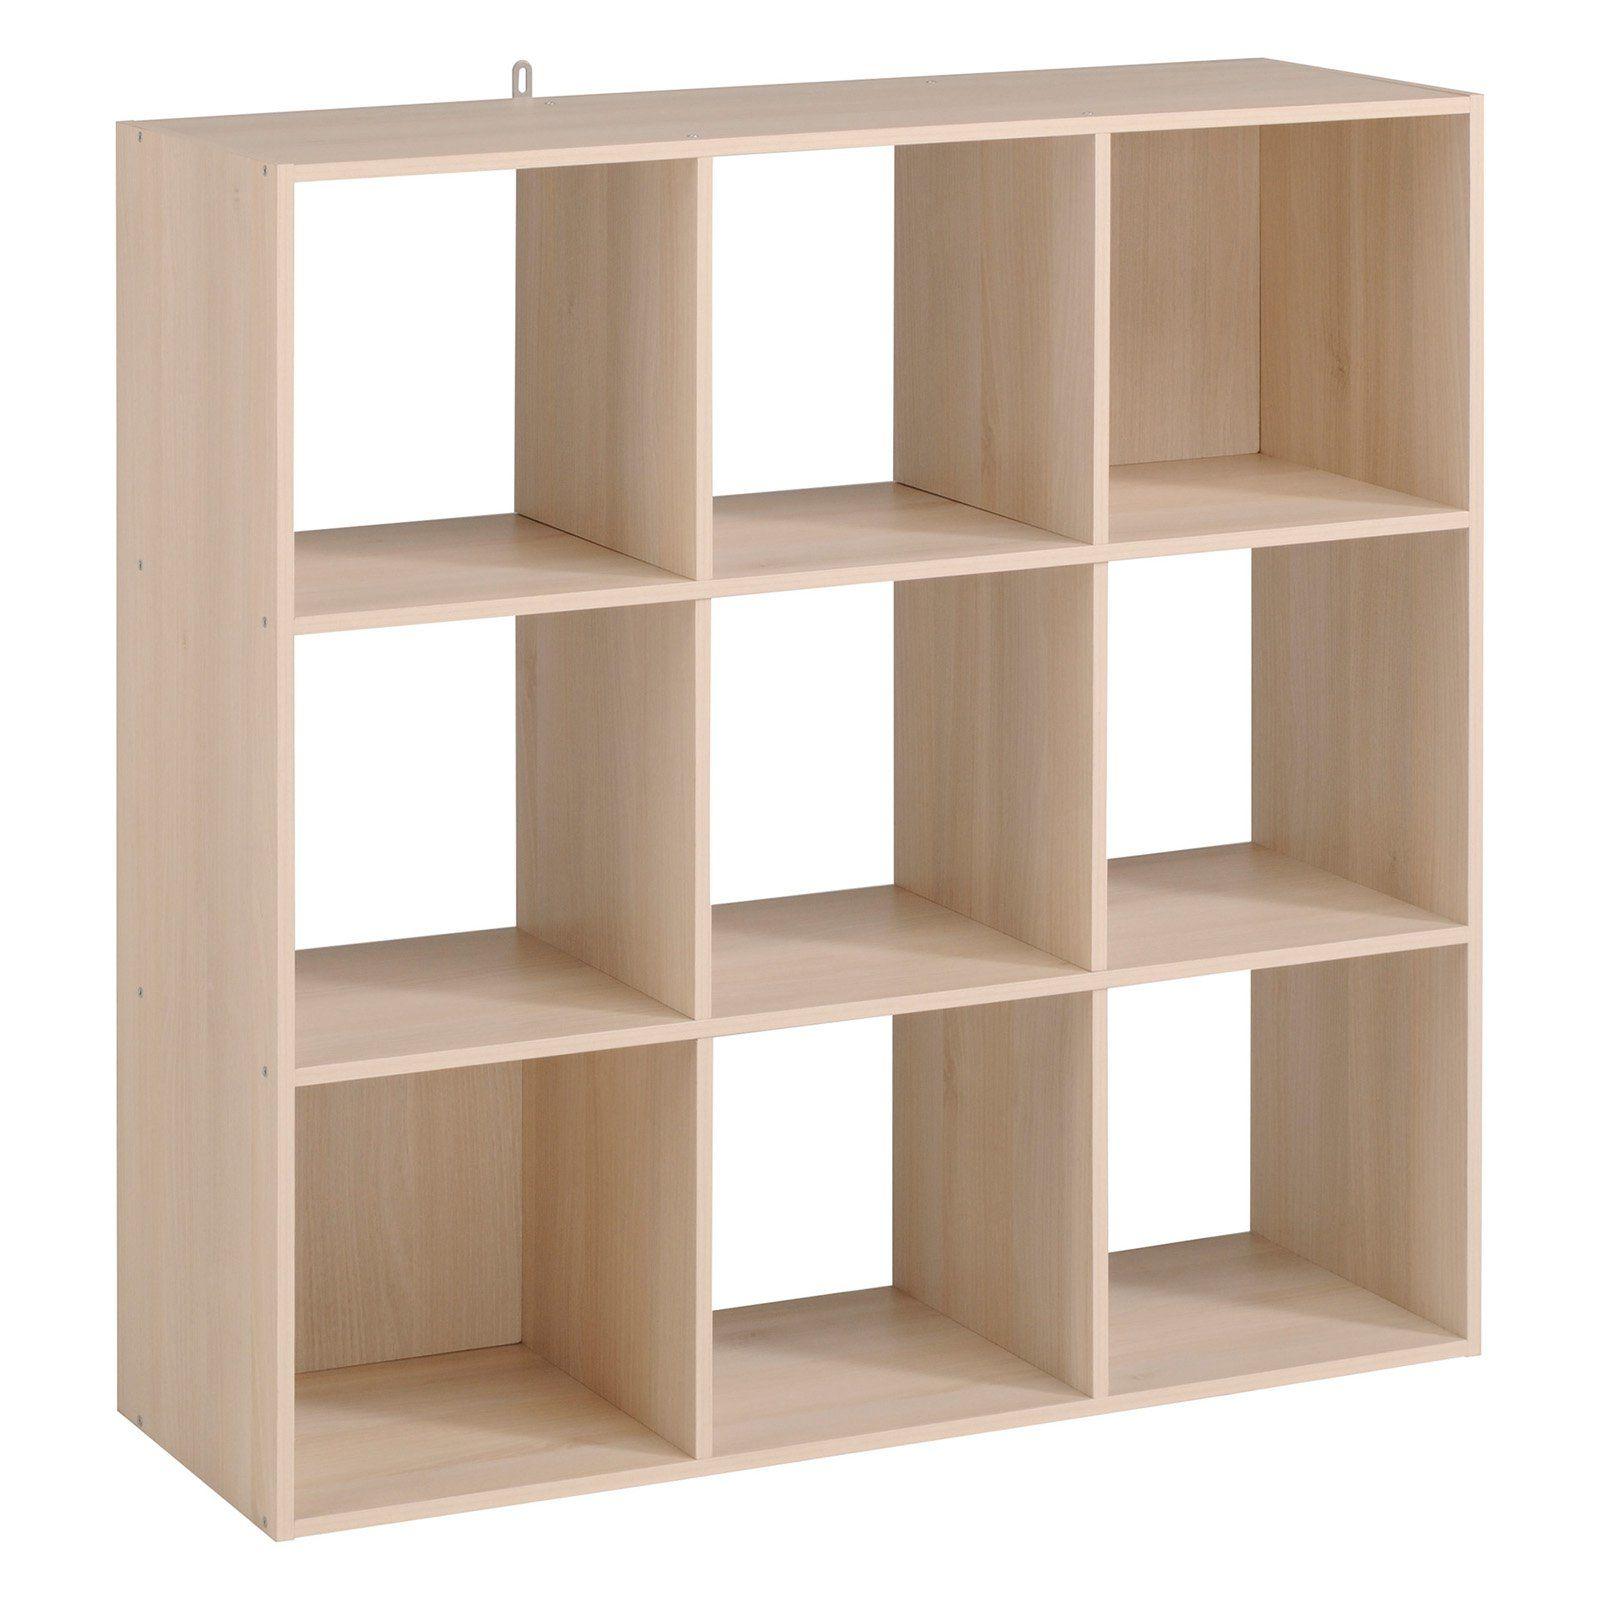 Parisot Kubikub 9 Cube Unit